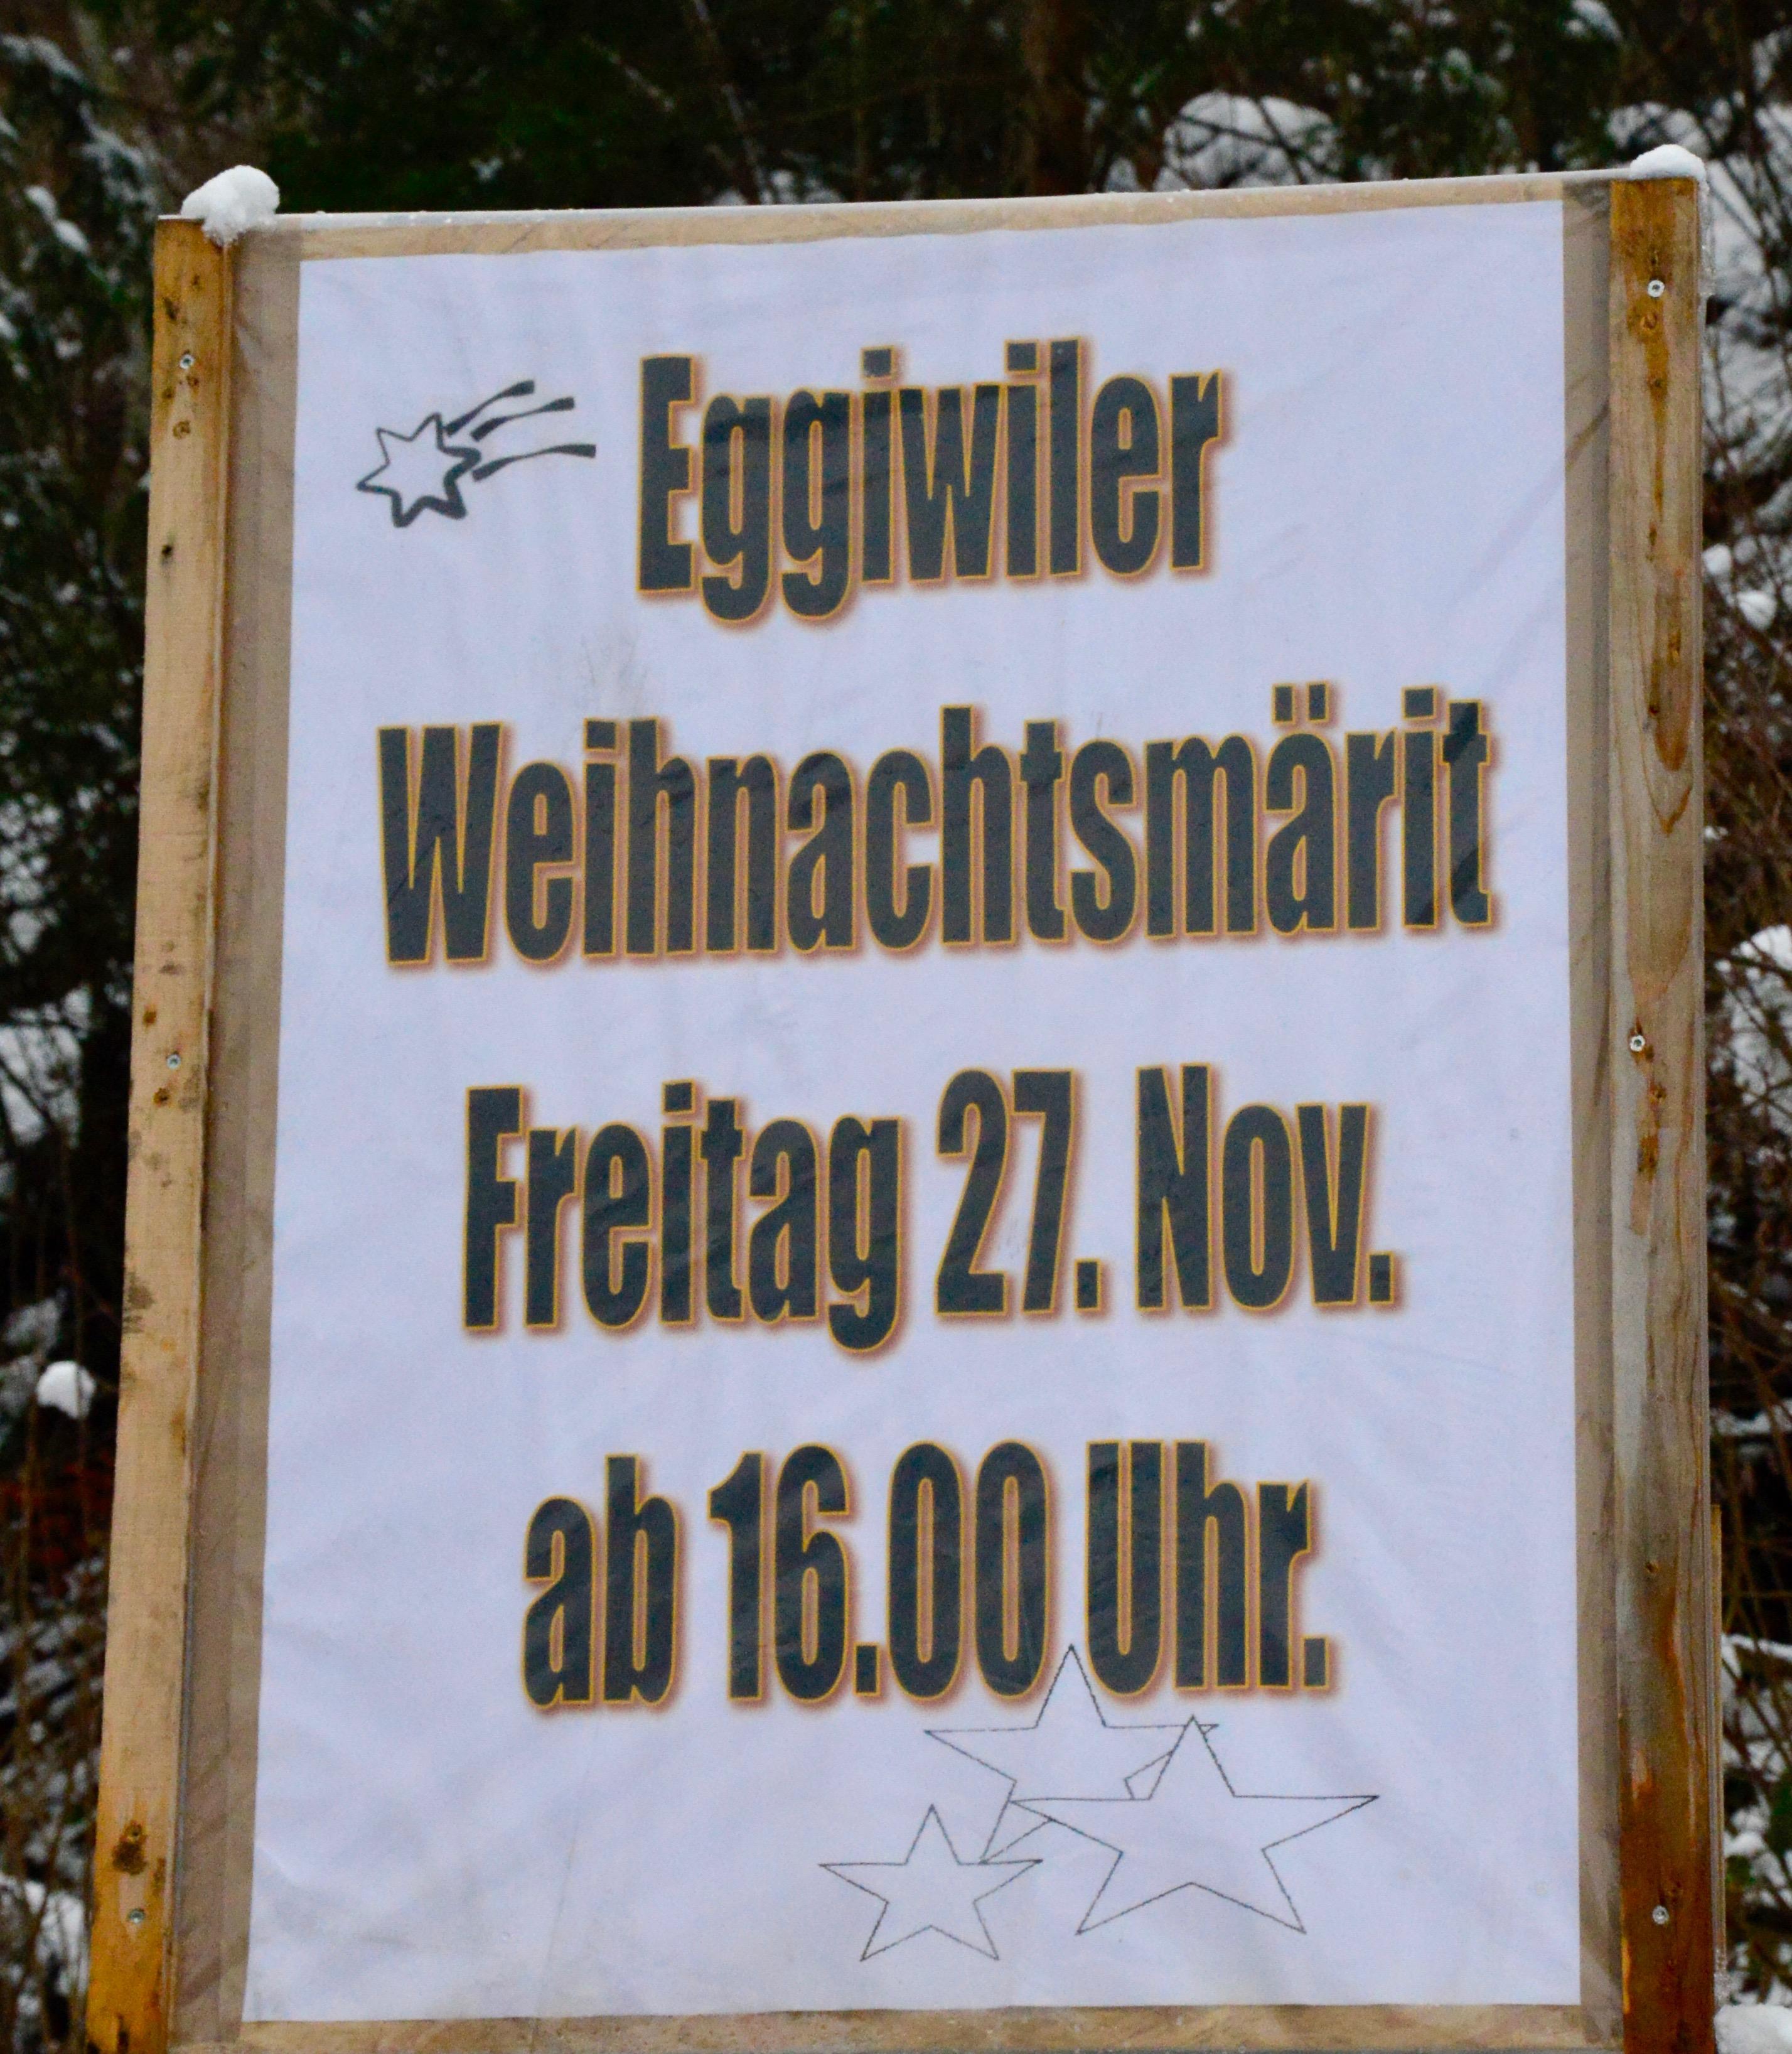 Eggiwiler Weihnachtsmärit Eggiwil Saison 2015/16